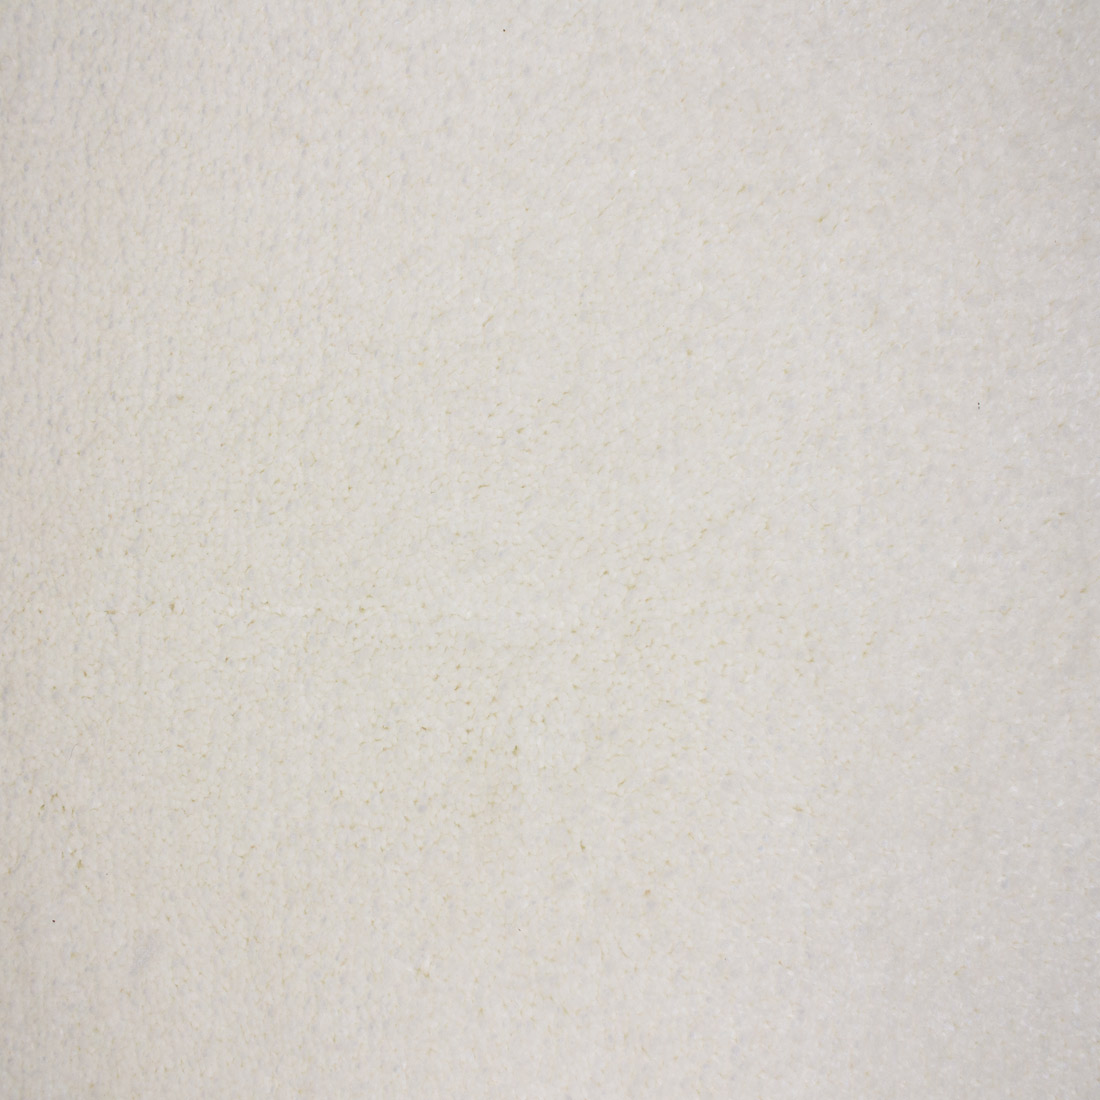 Vloerkleed Xilento Soft Bloesem | 170 x 230 cm